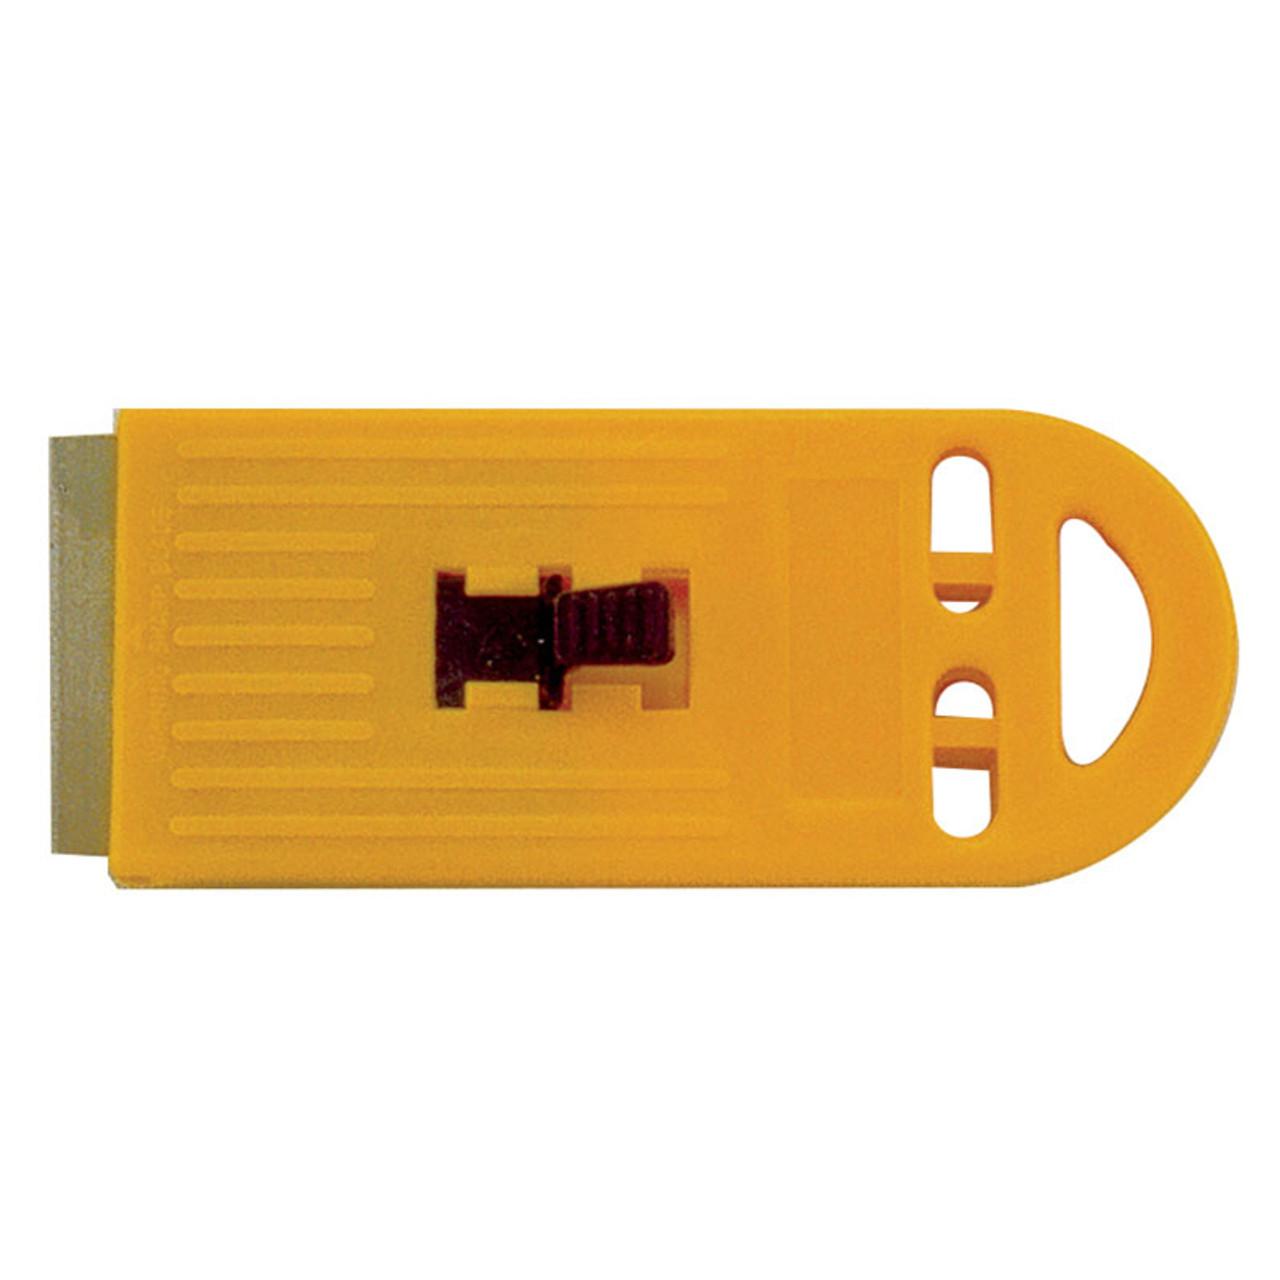 Yellow Plastic Scraper with 1 blade